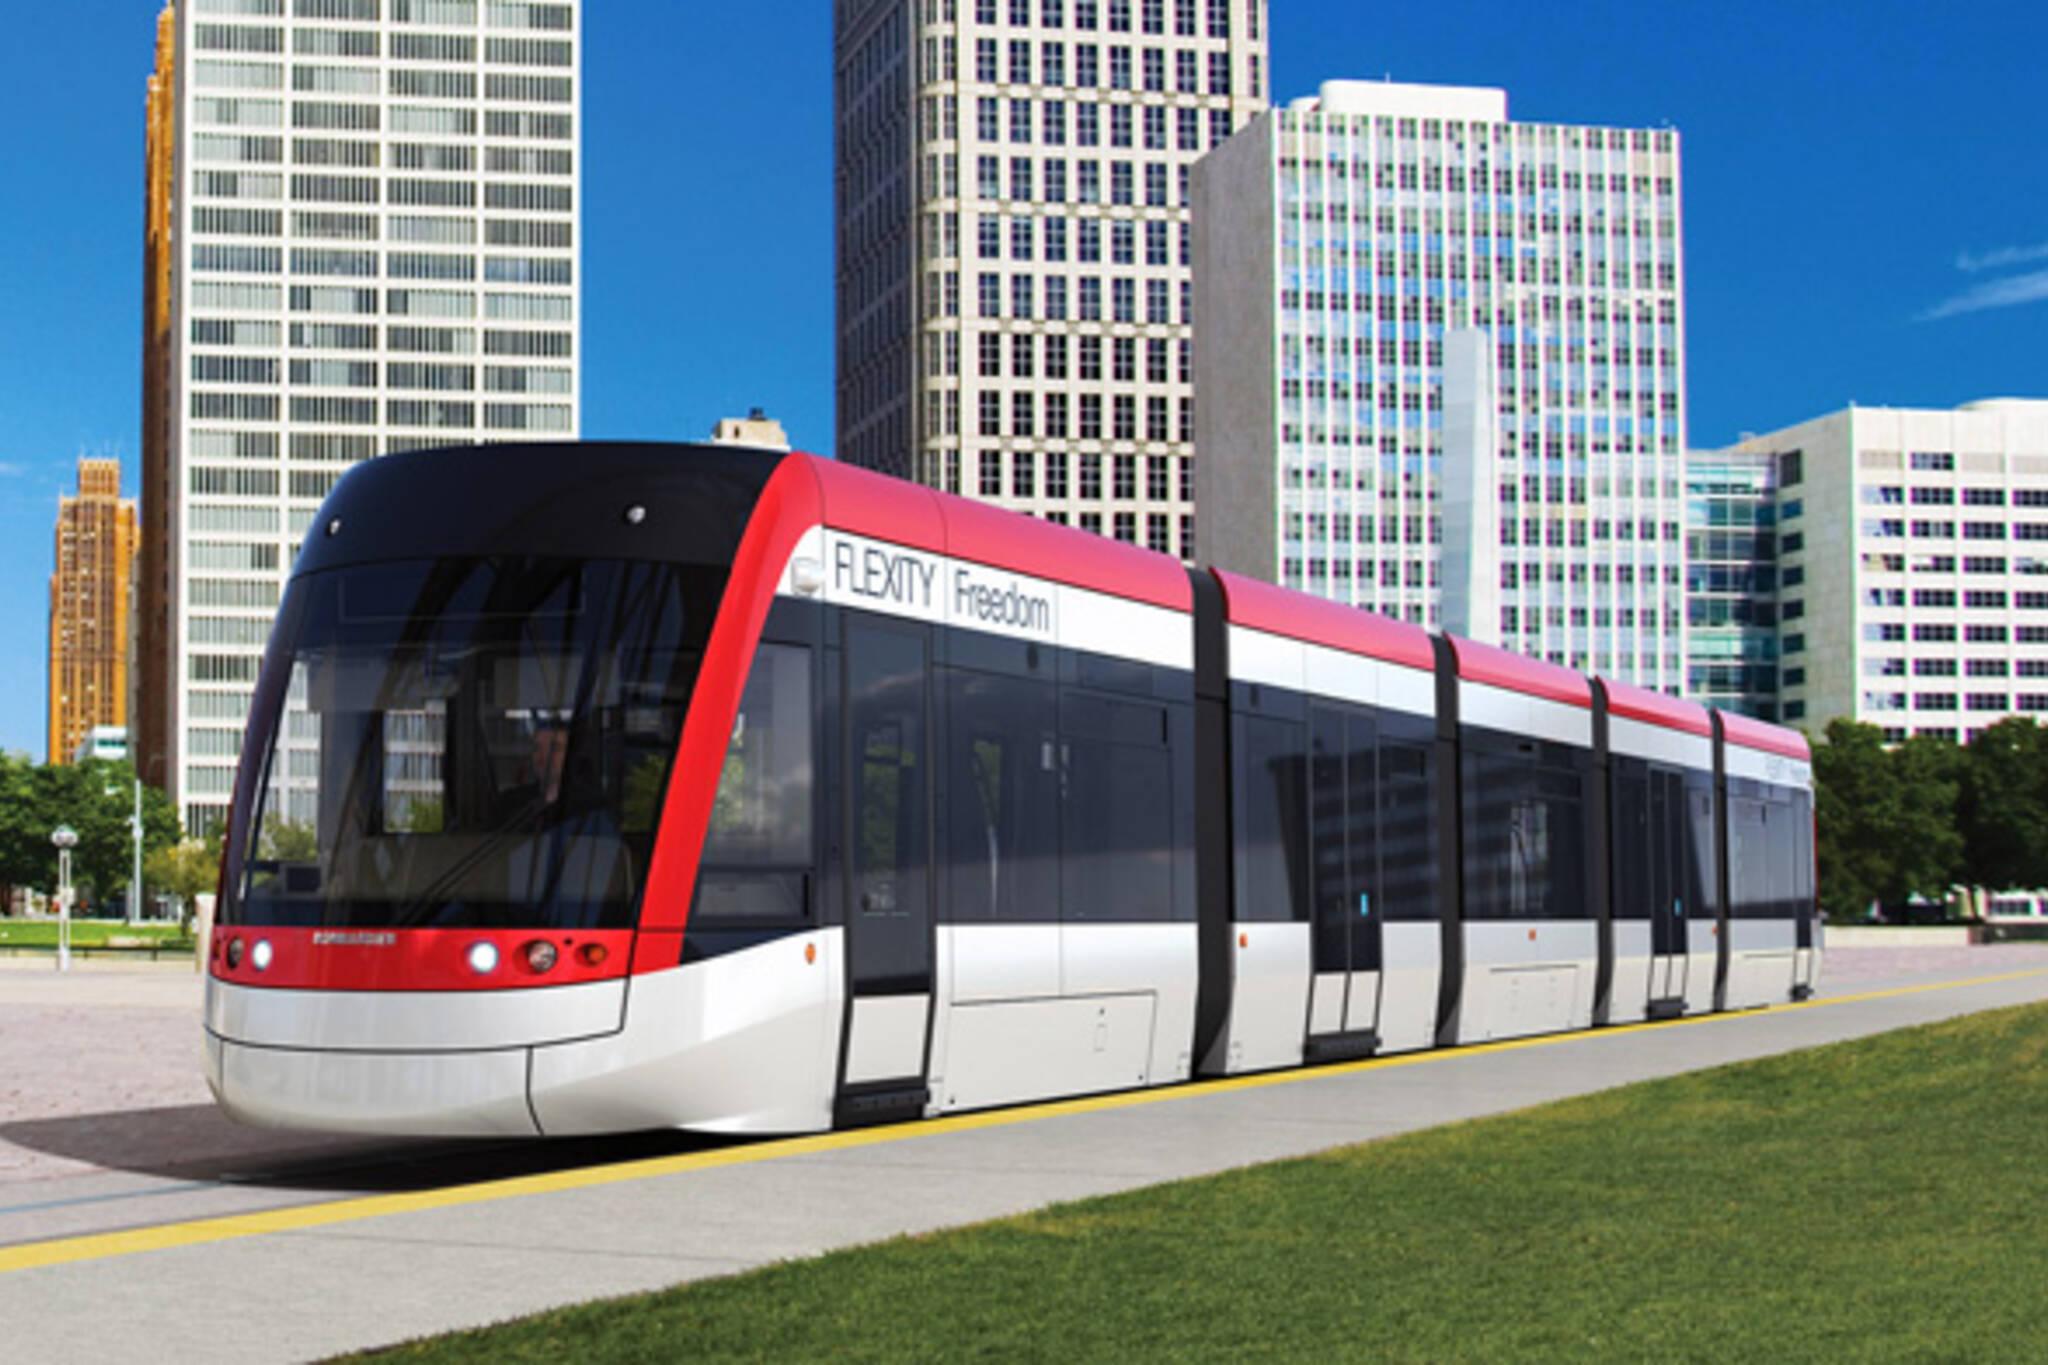 Eglinton Crosstown LRT Toronto